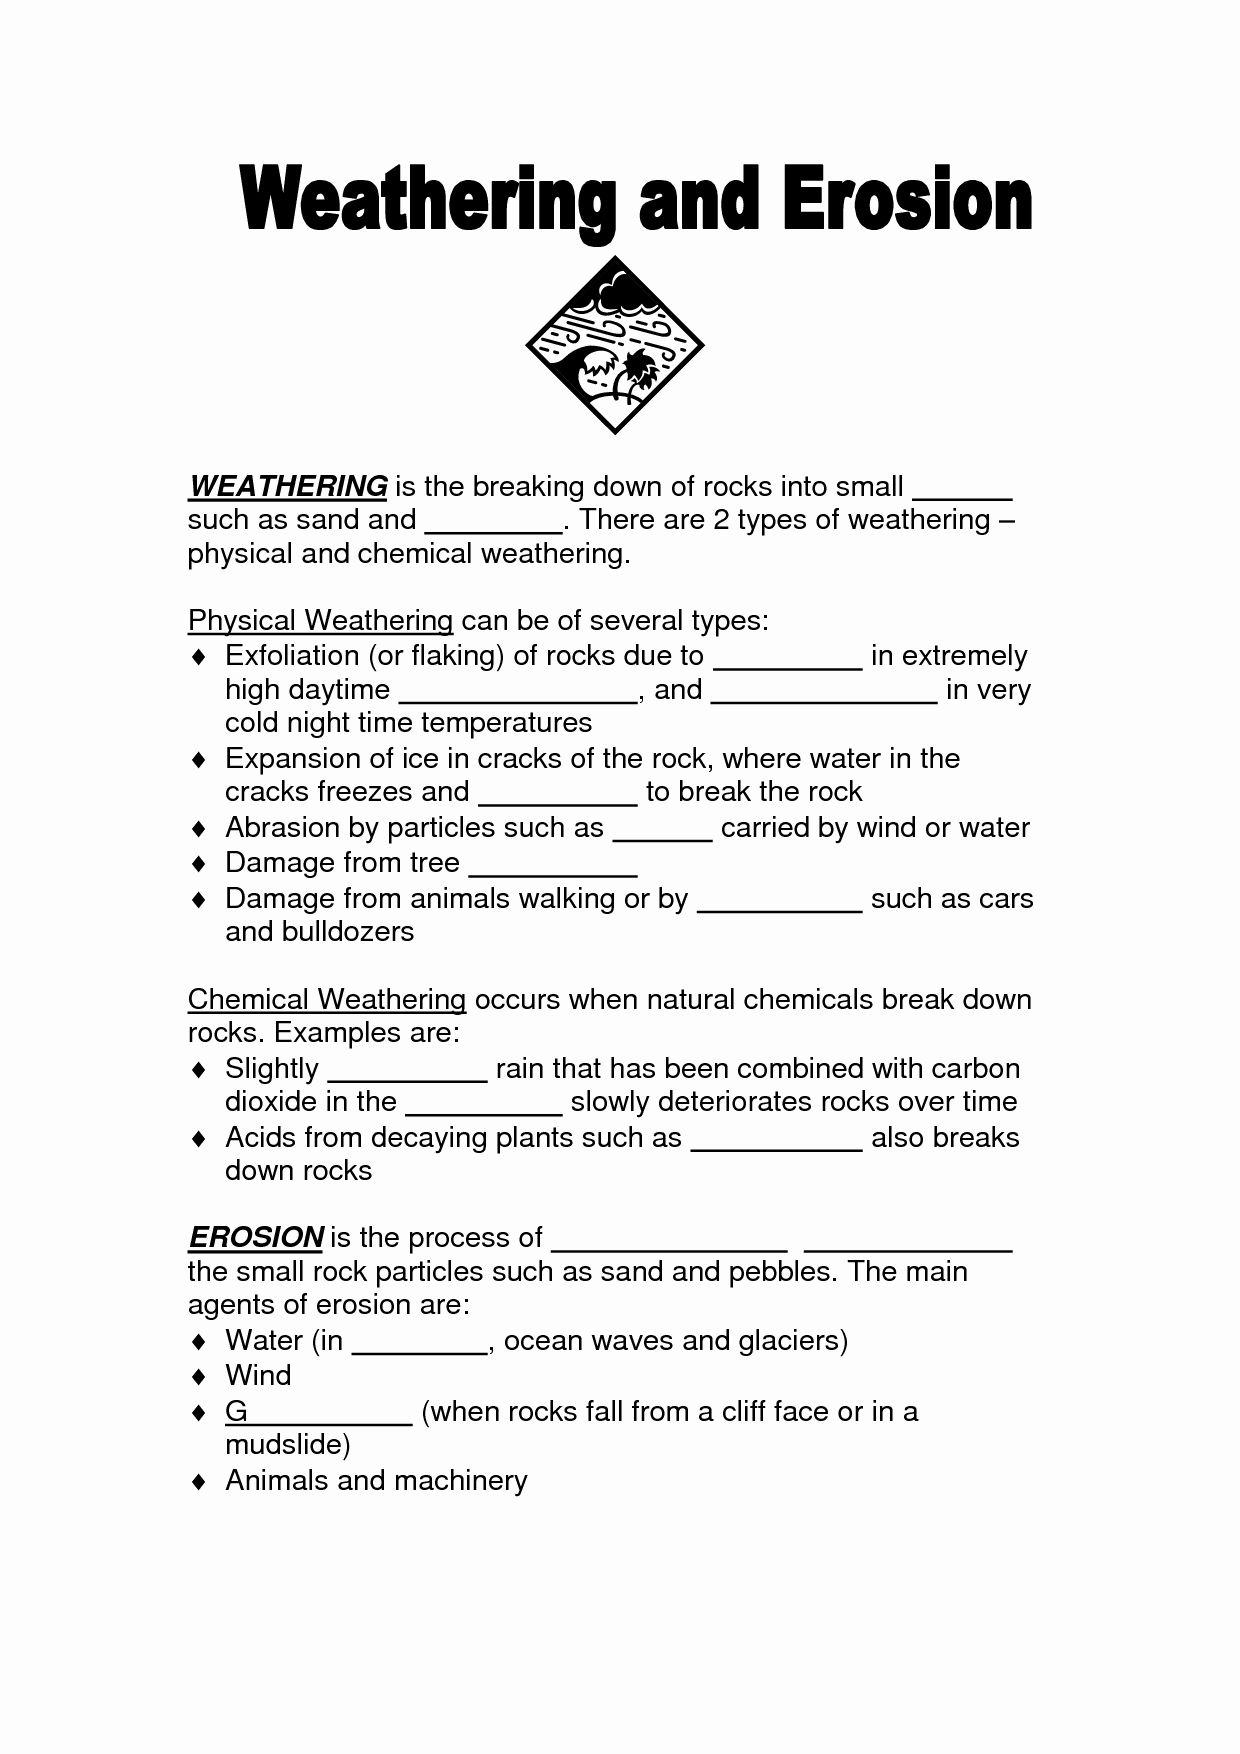 Weathering Erosion And Deposition Worksheet Elegant 16